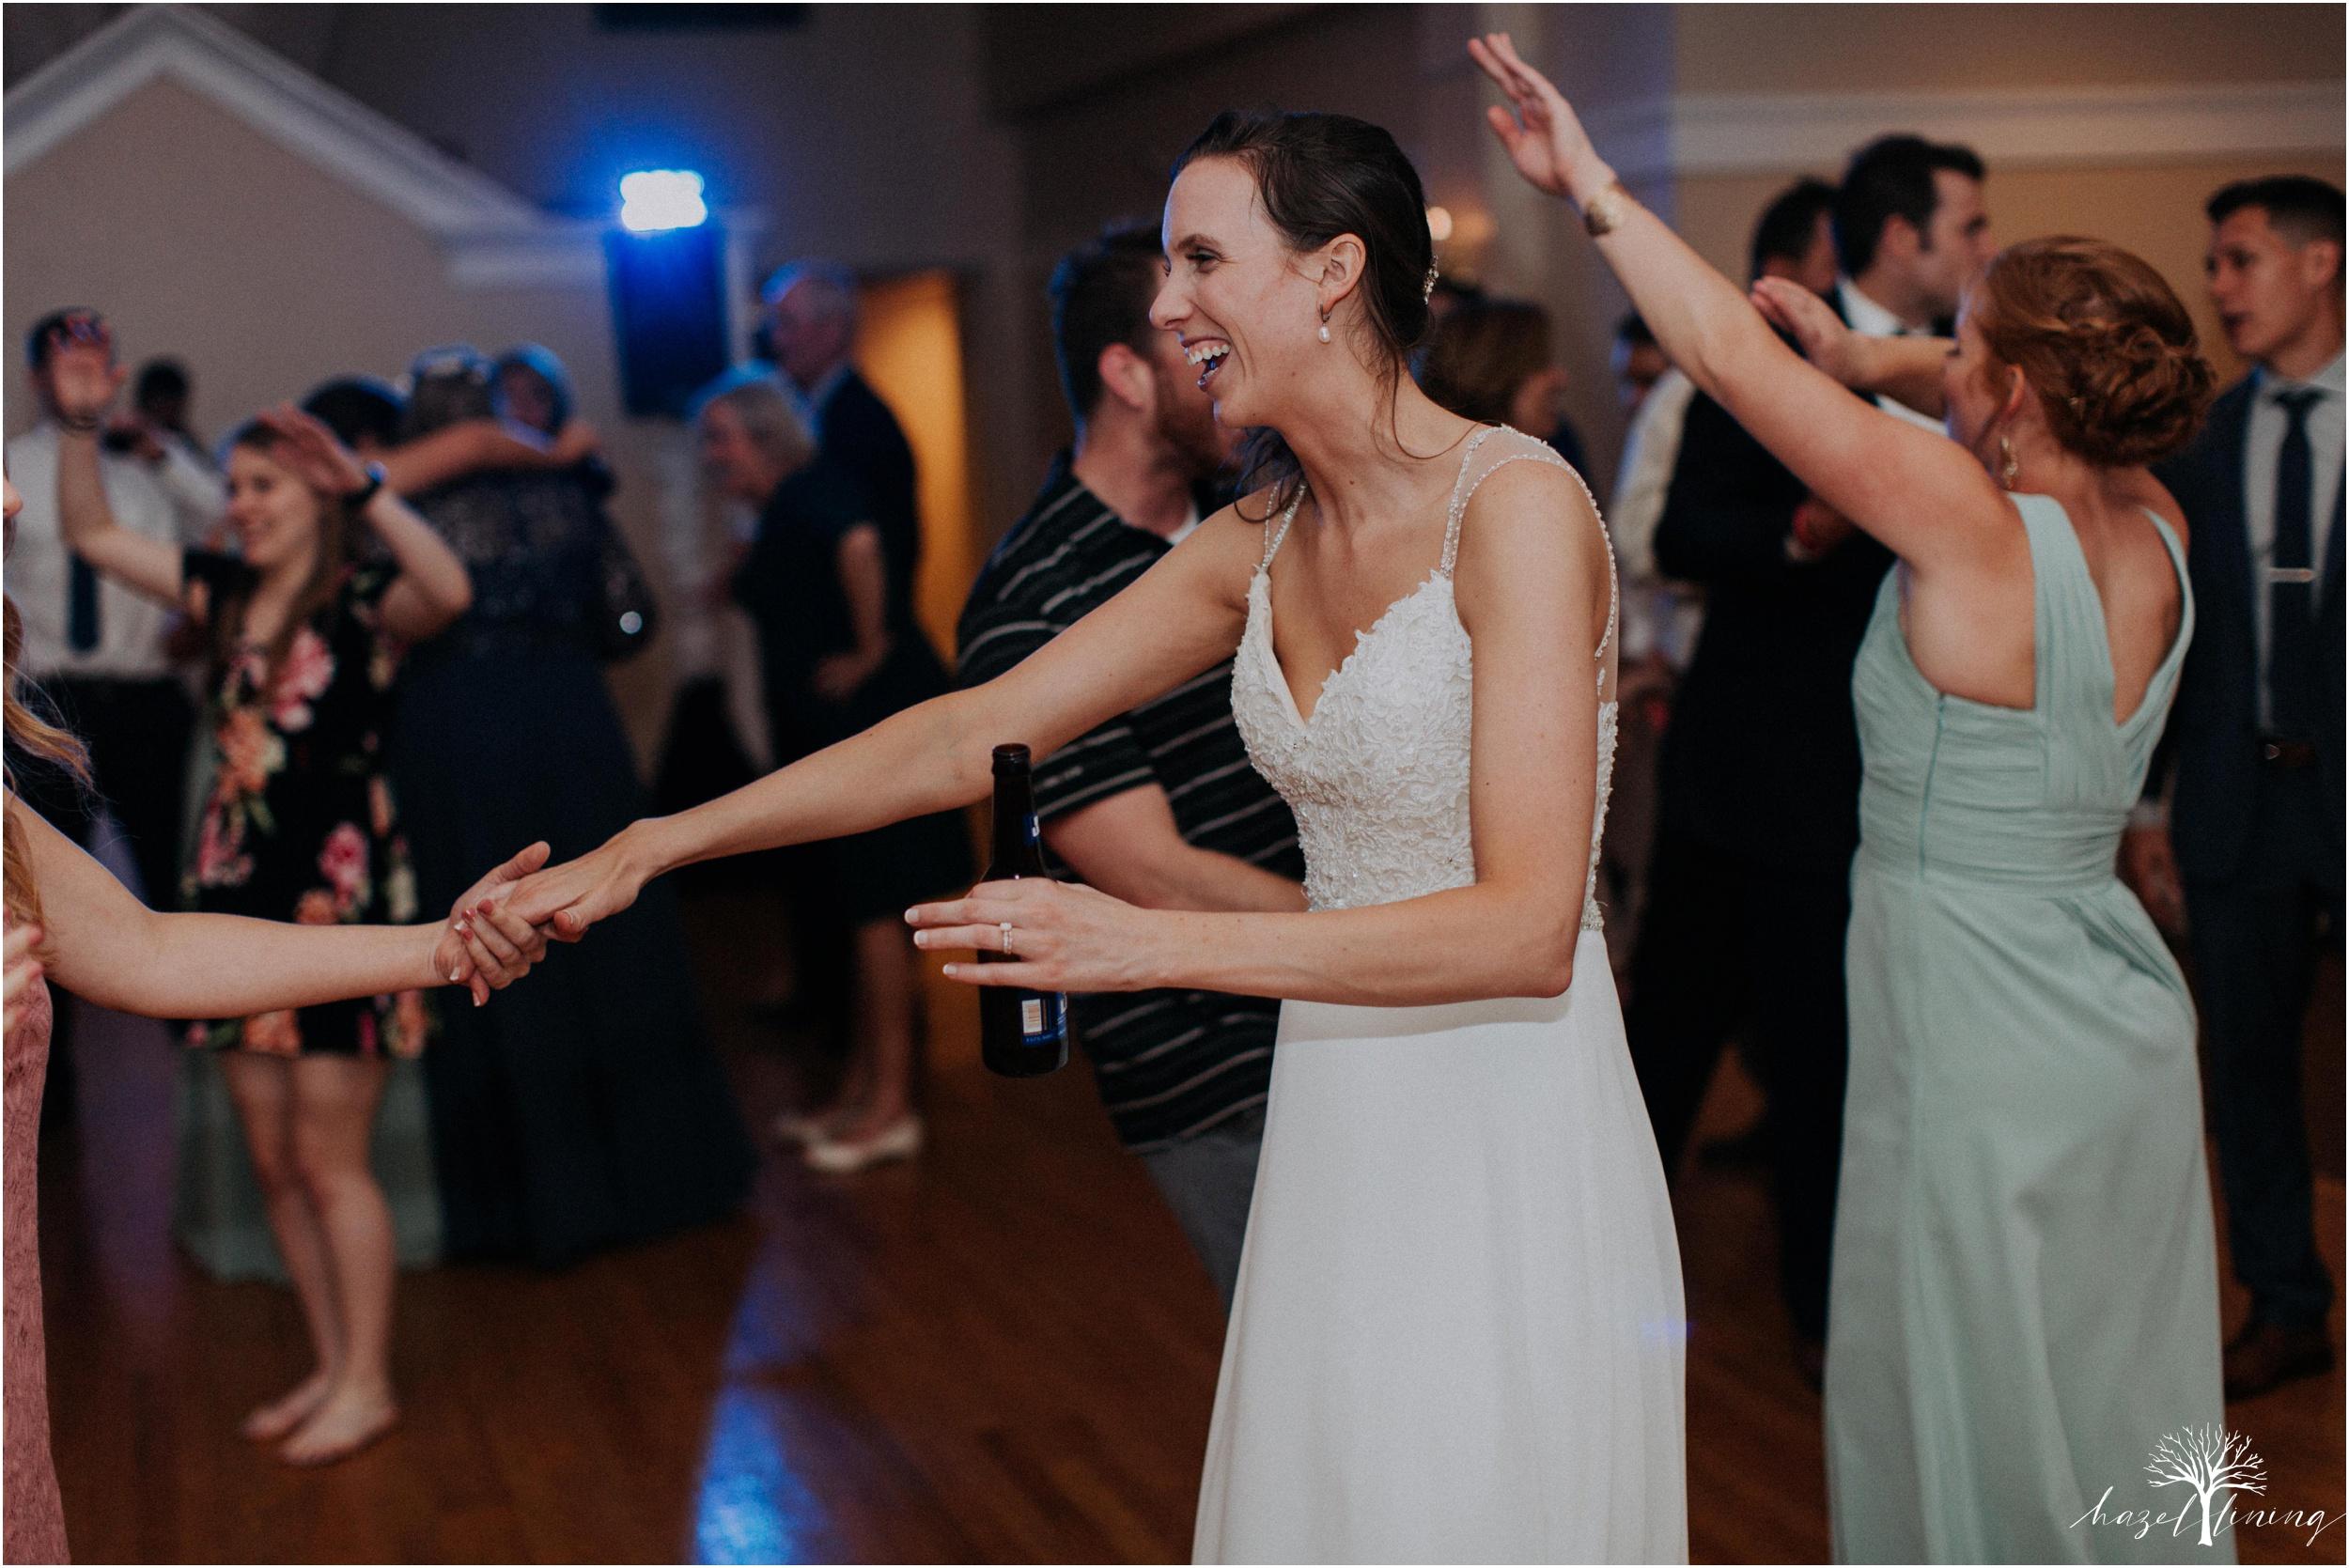 hazel-lining-travel-wedding-elopement-photography_0161.jpg